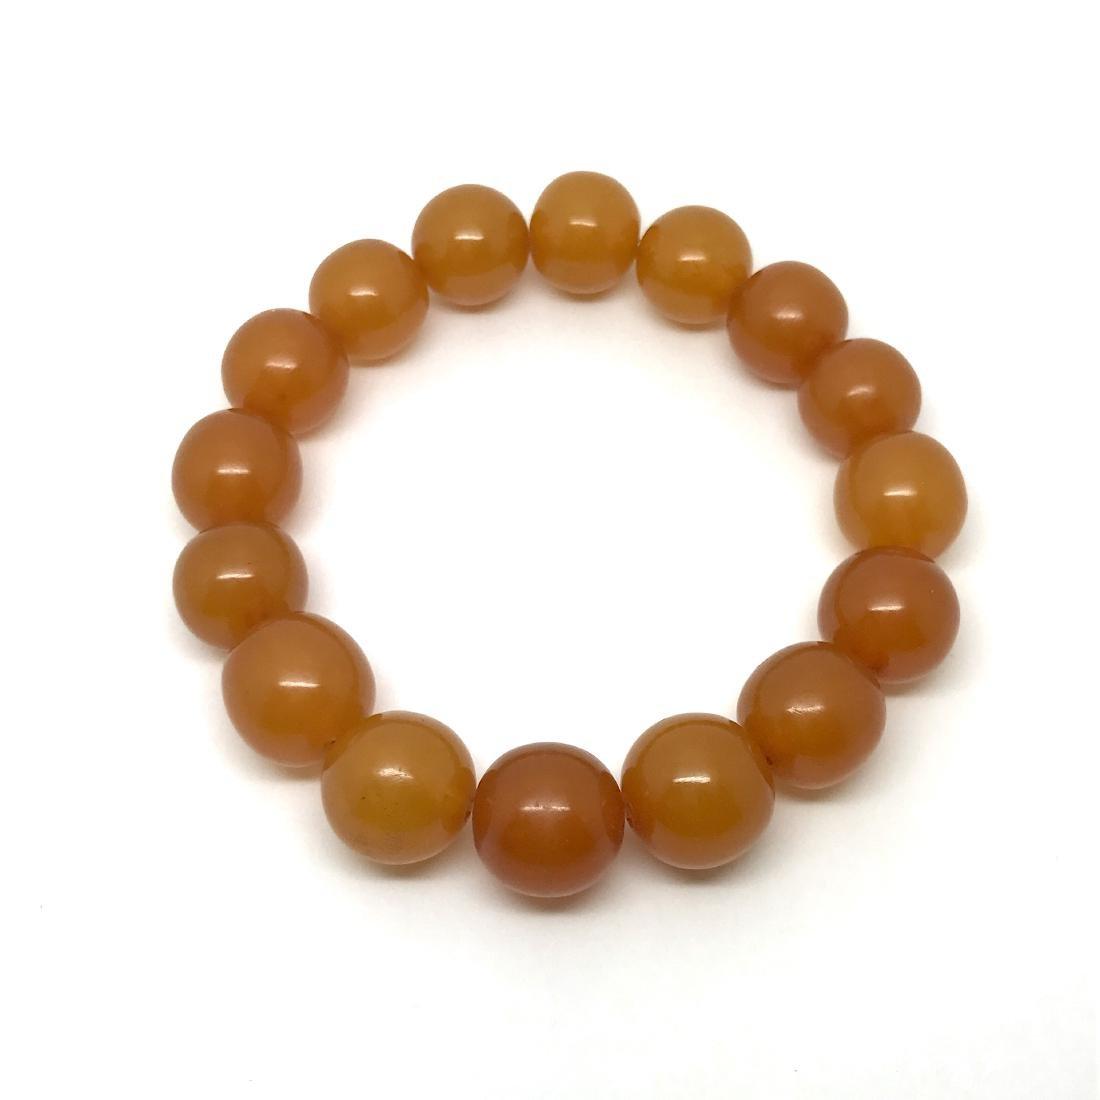 Antique Baltic amber beads bracelet 21.5 gr - 2